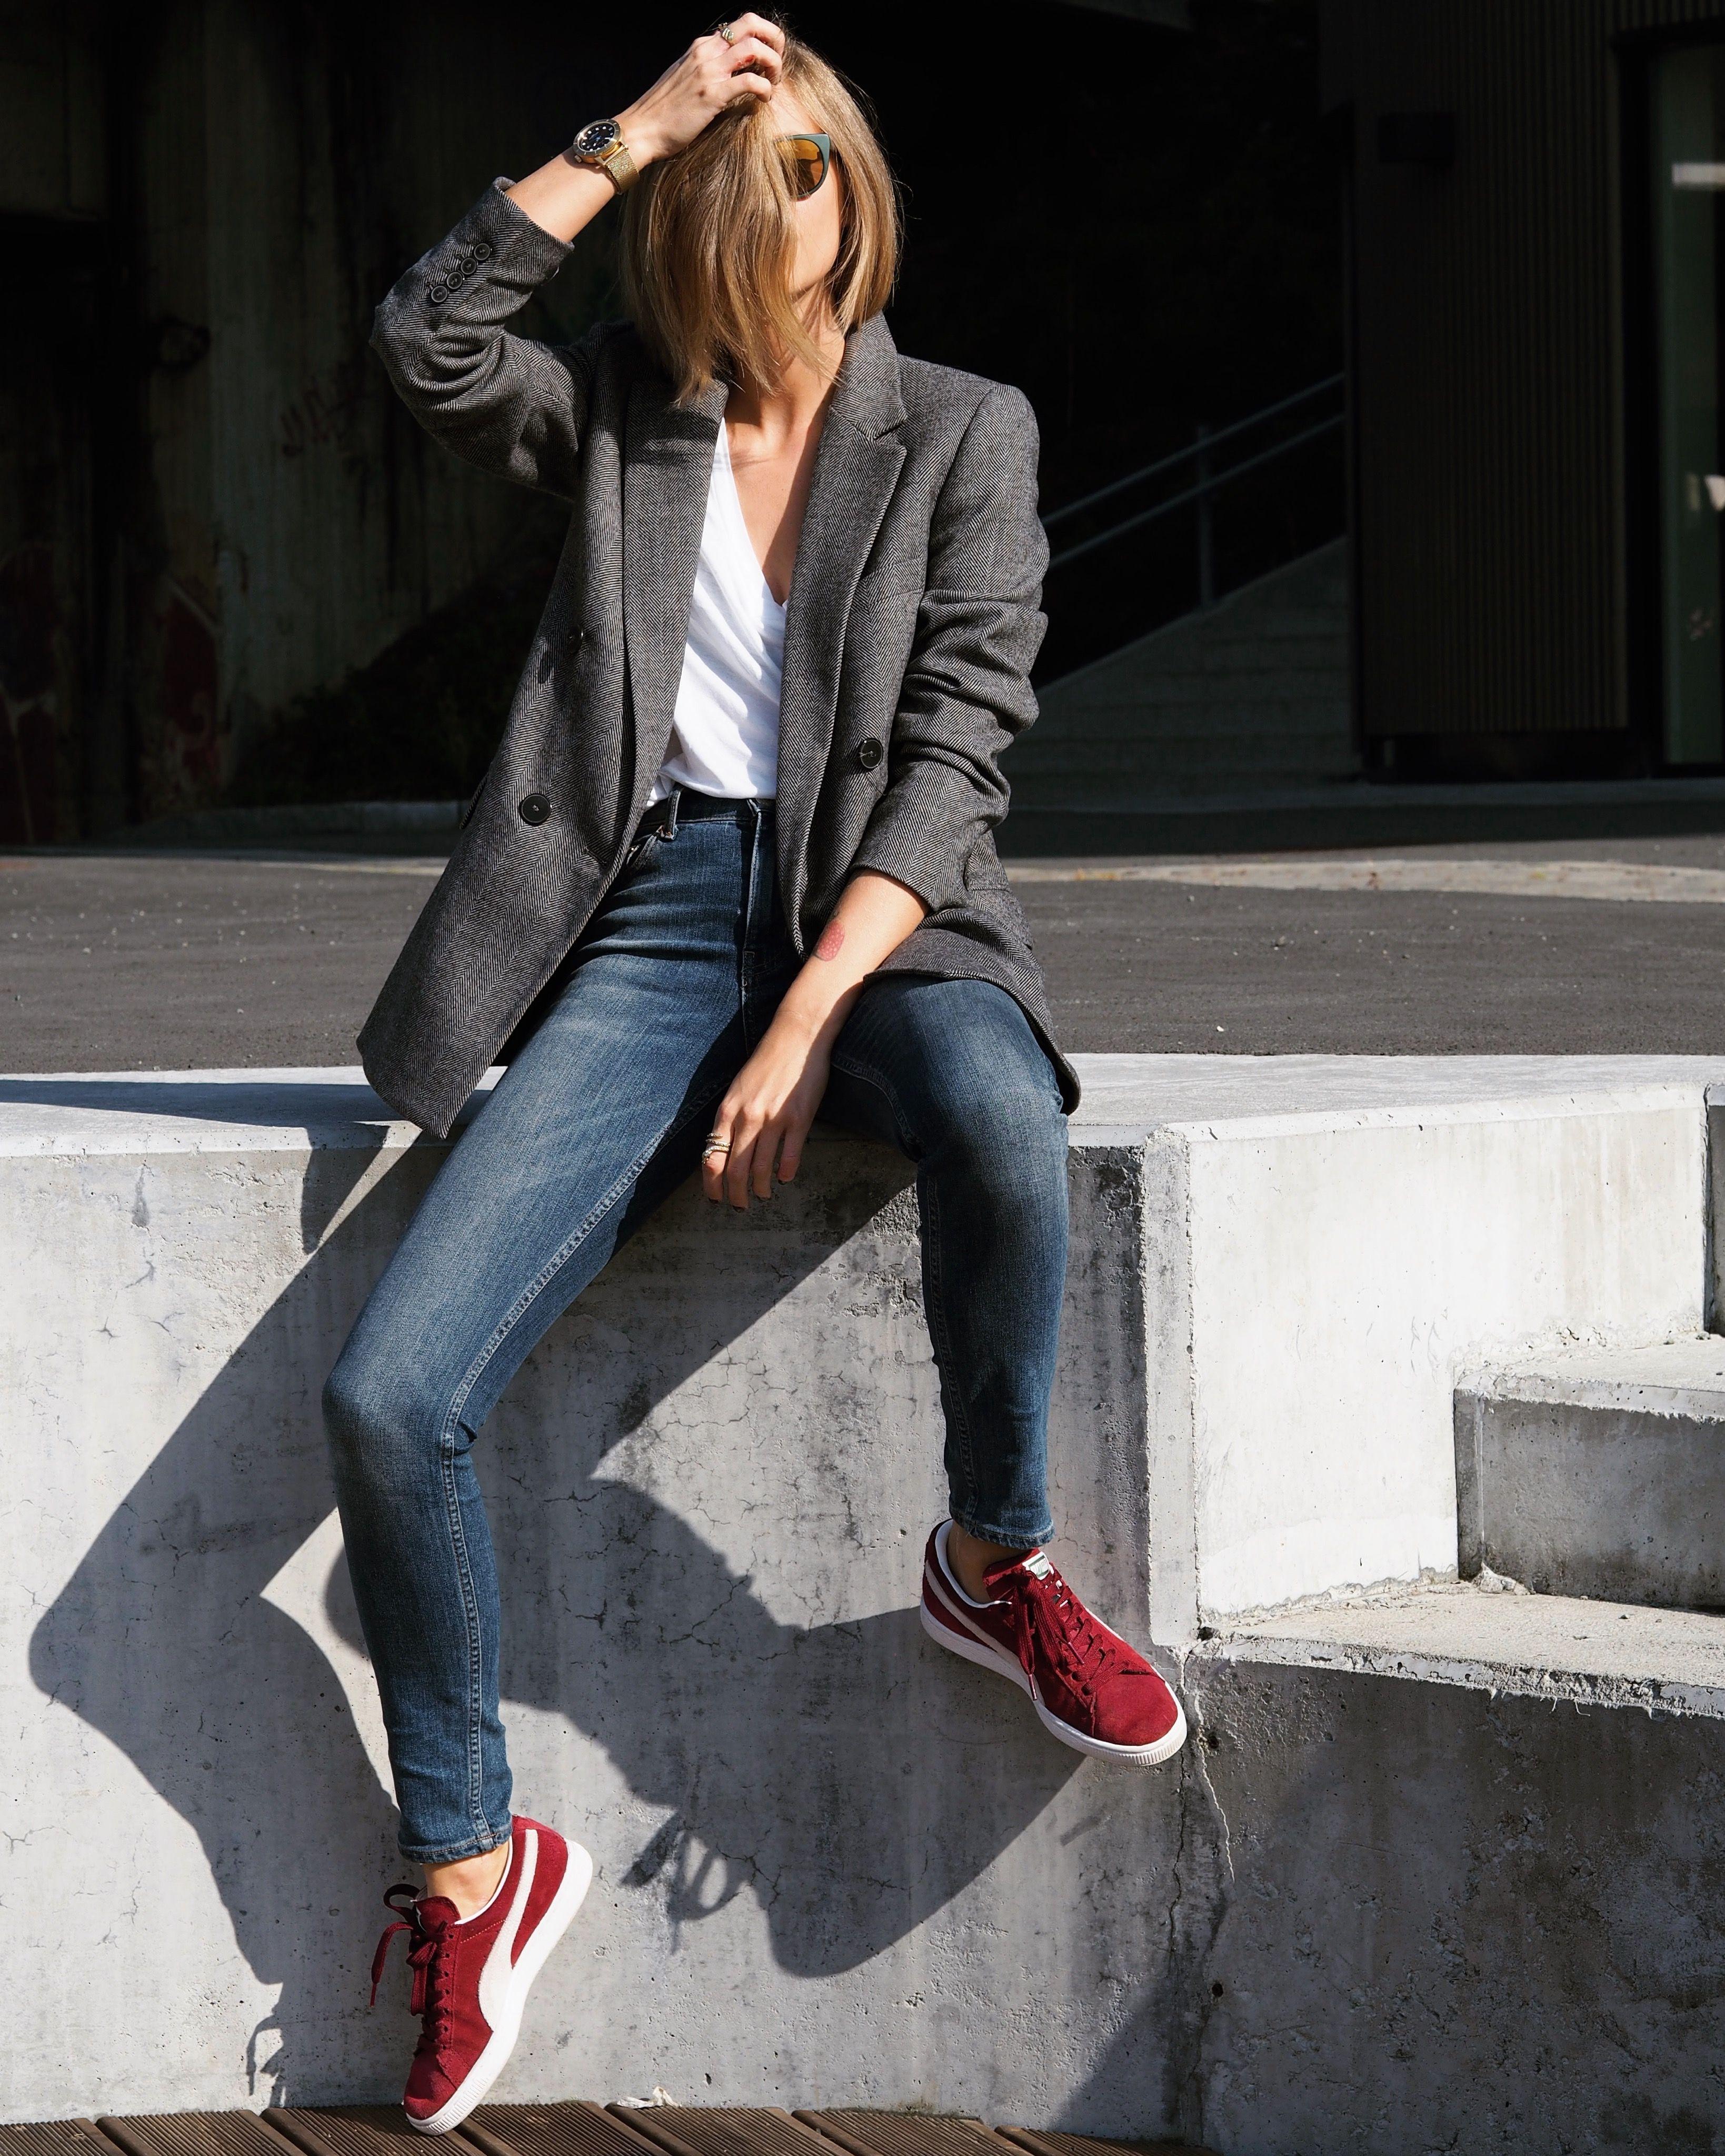 jeans, grey blazer, burgundy sneakers